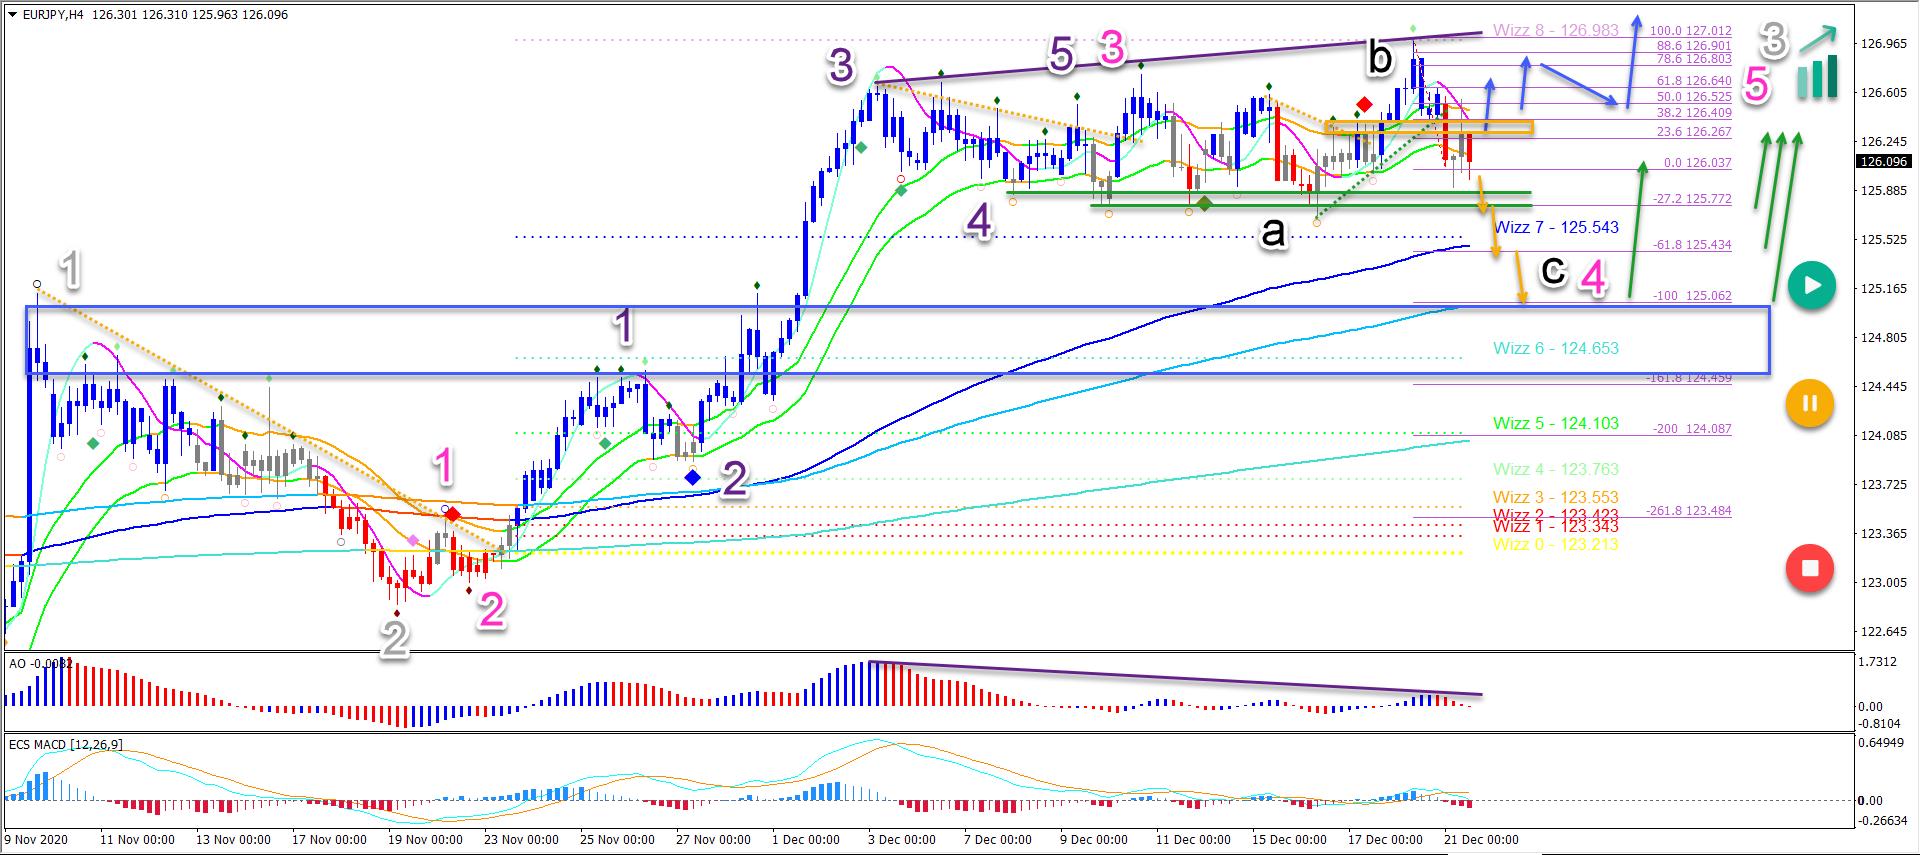 EUR/JPY 21.12.2020 4 hour chart